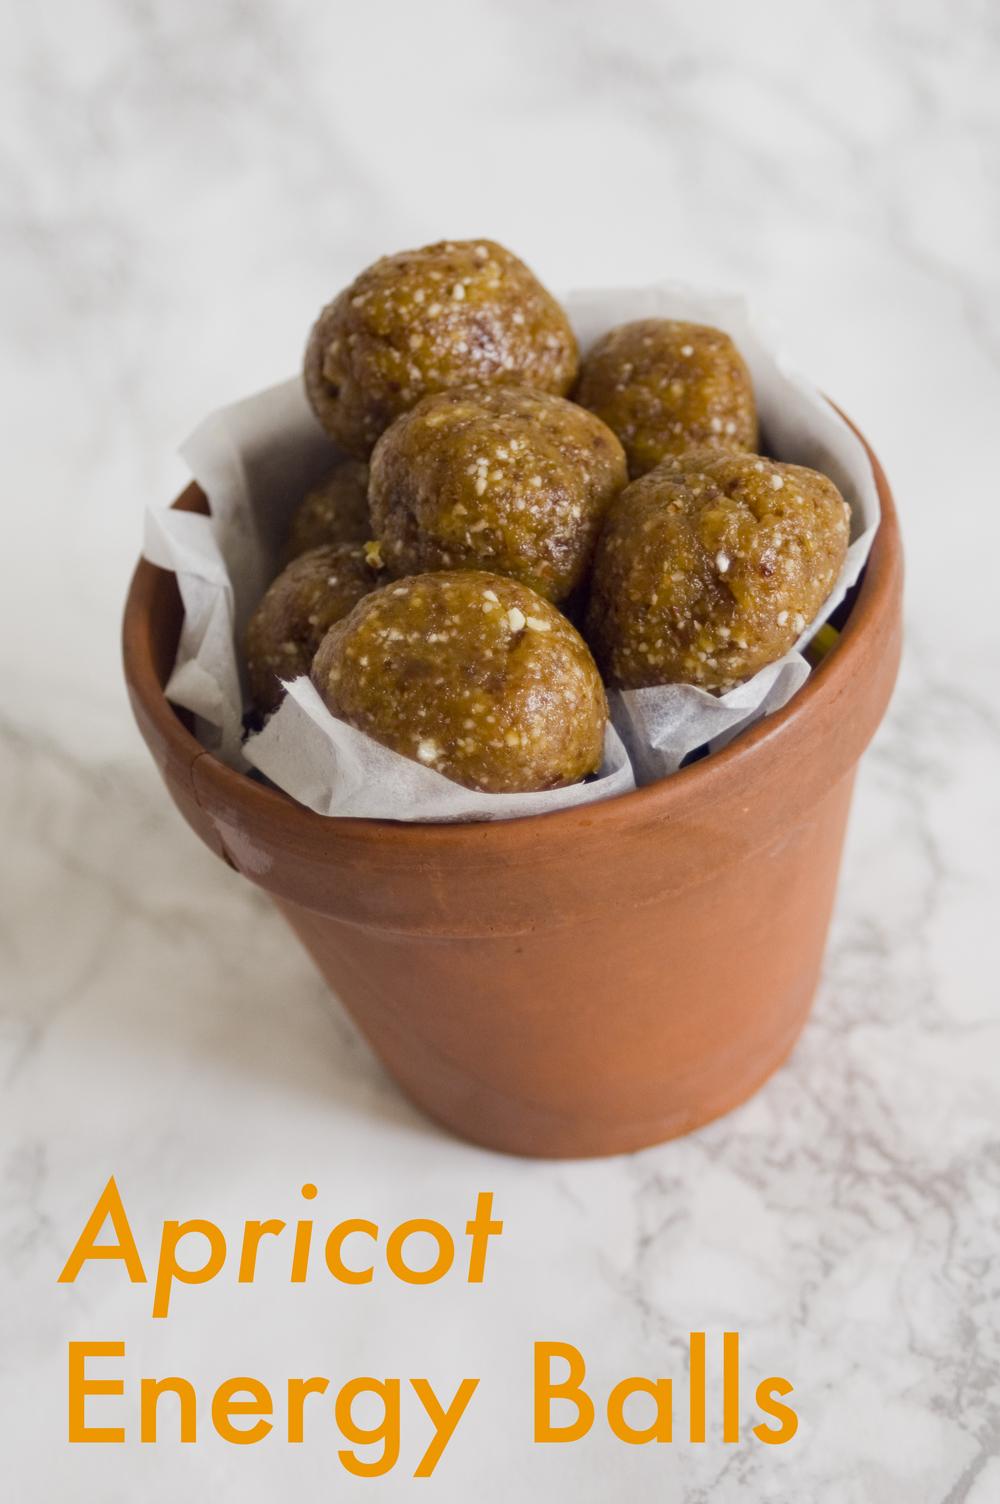 Apricot-energy-balls-recipe-sneaky-veg